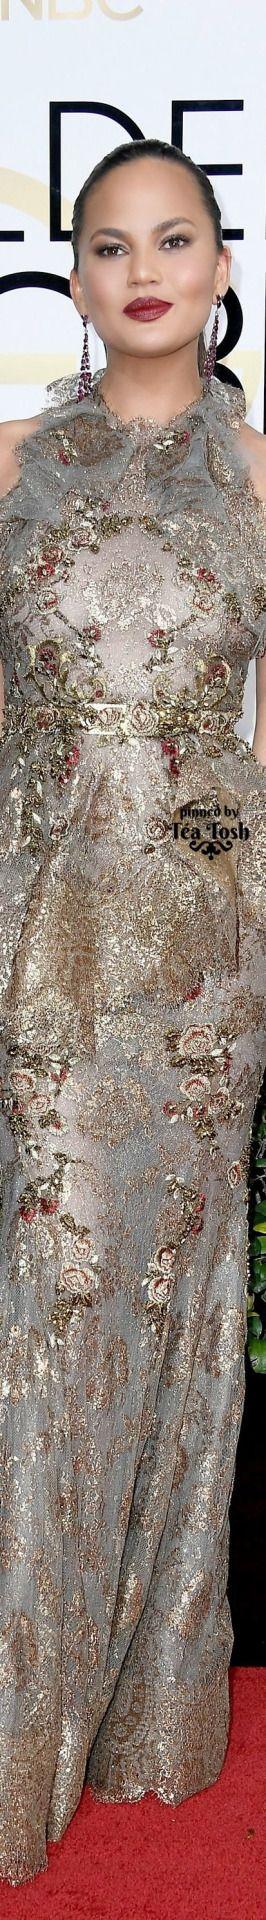 ❇Téa Tosh❇ Chrissy Teigen, wearing a Marchesa dress with Stuart Weitzman shoes and Lorraine Schwartz jewels.